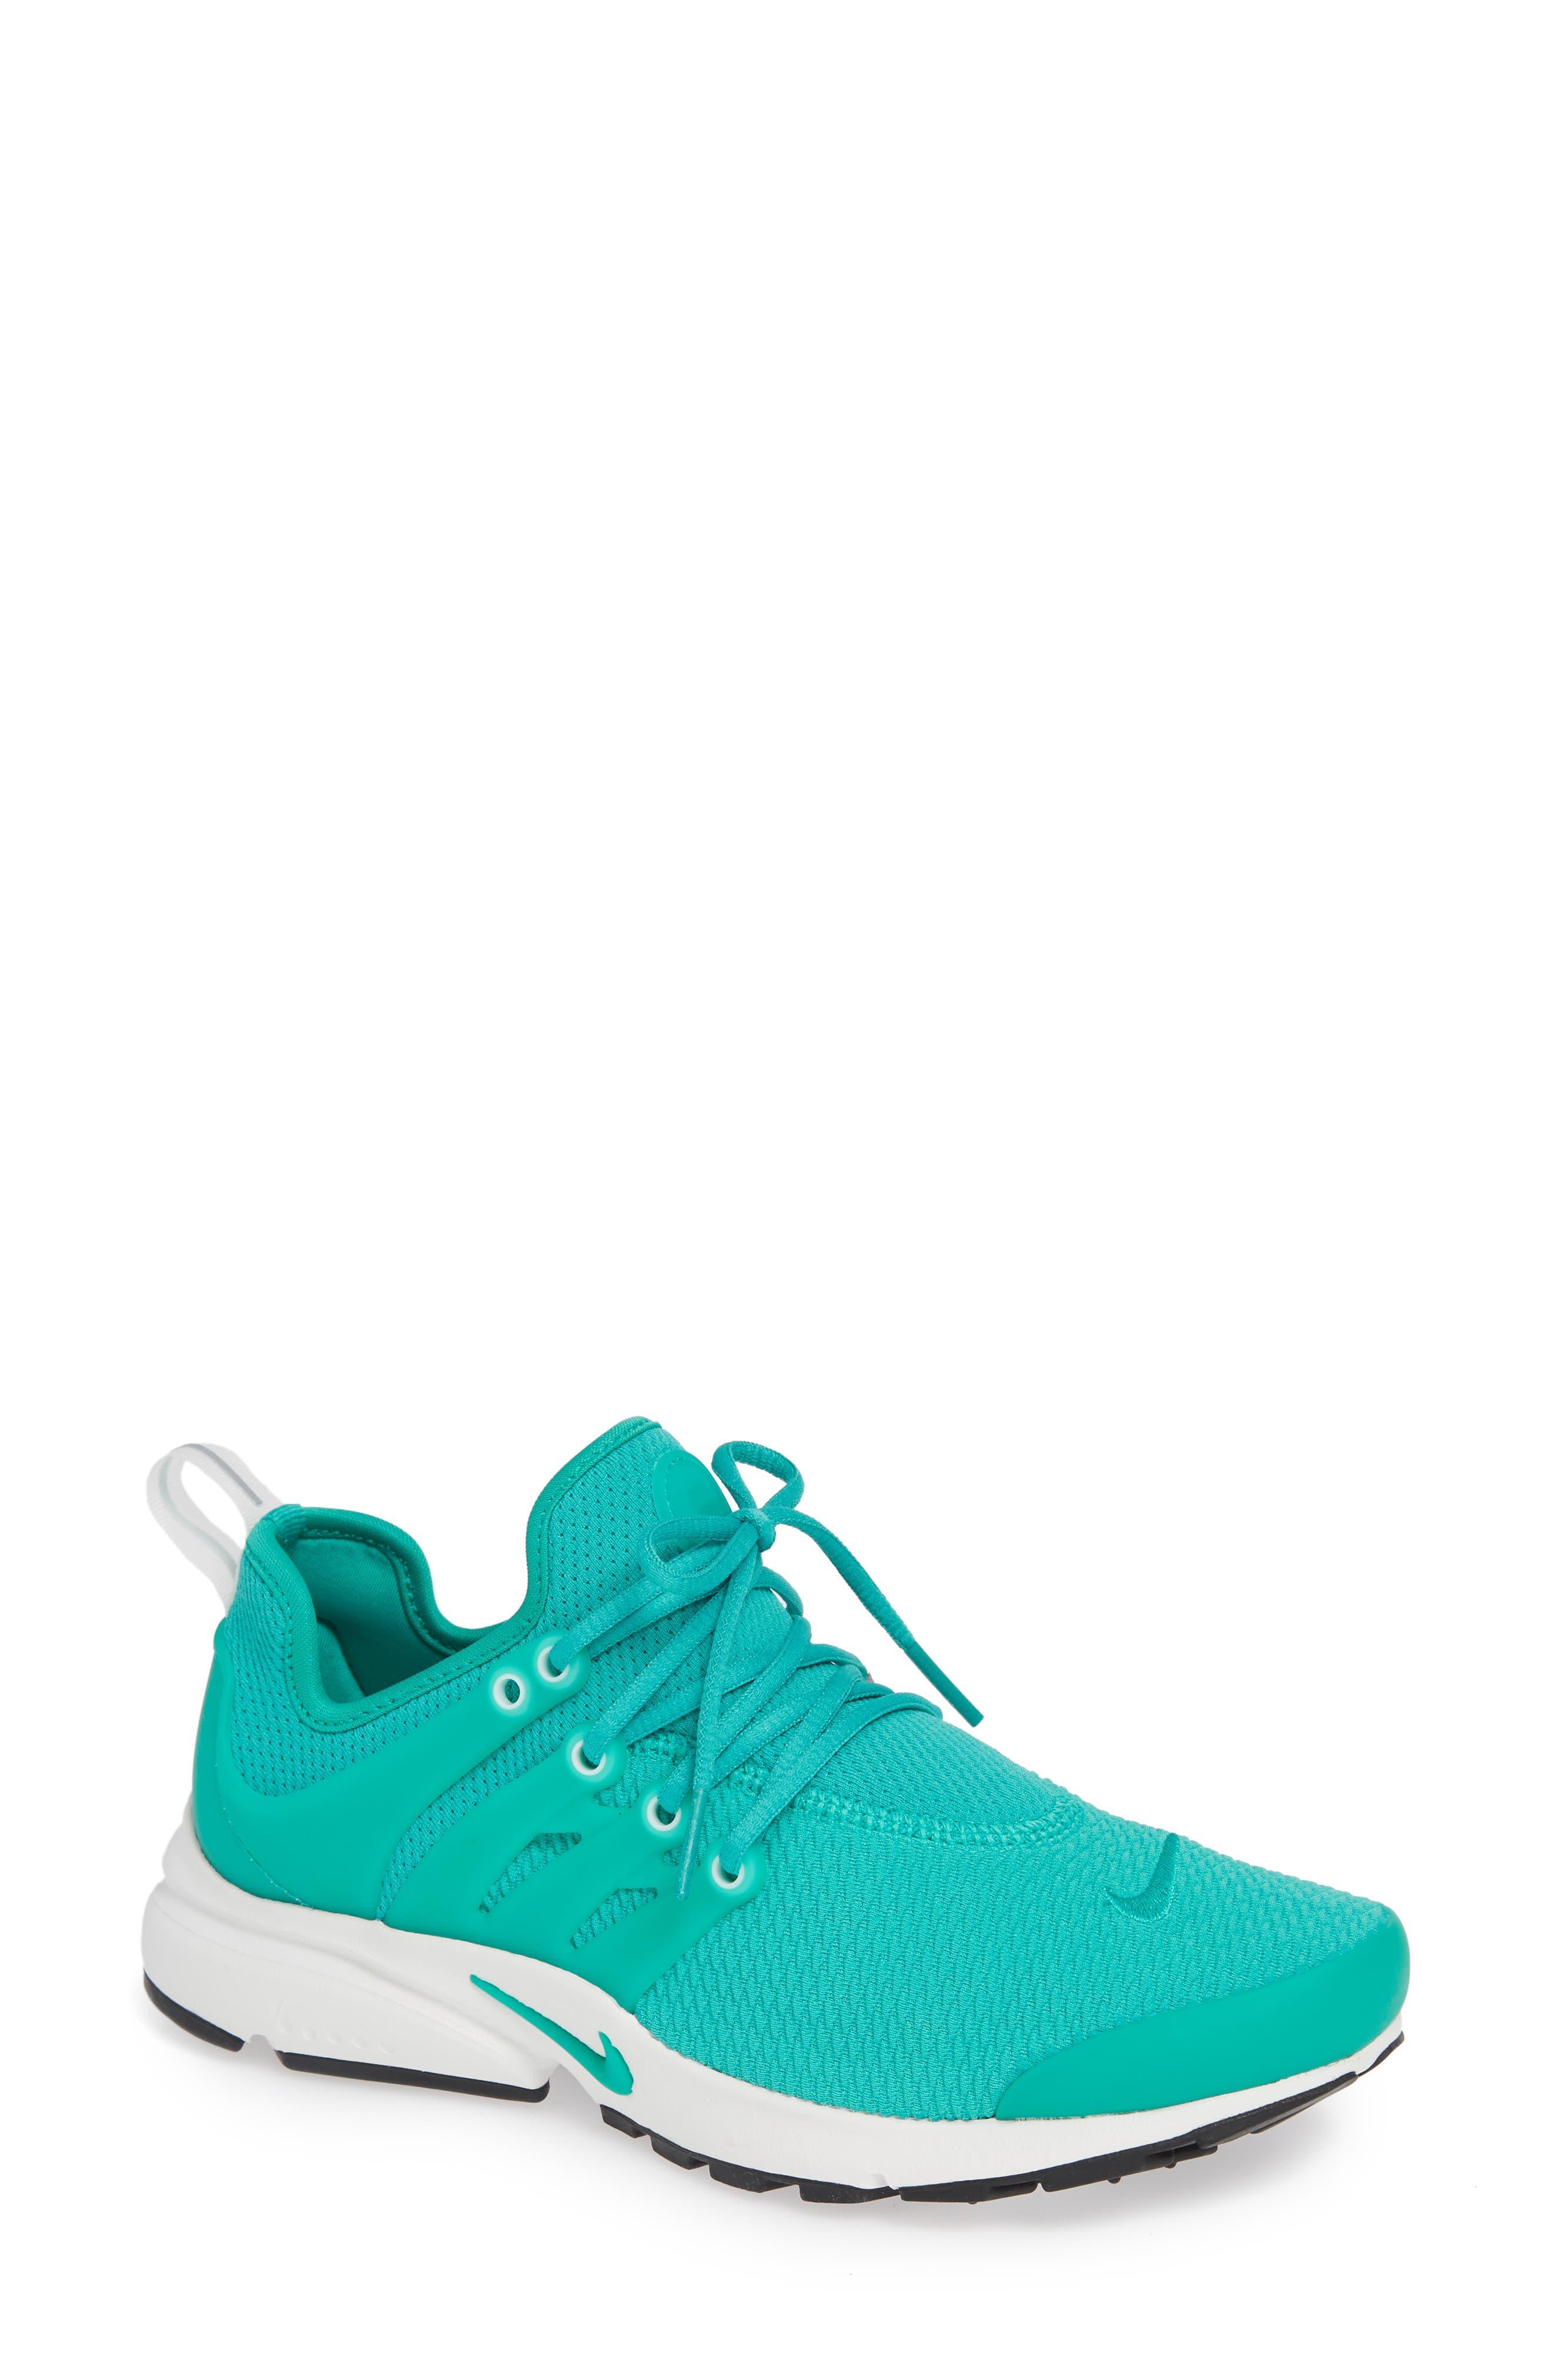 Air Presto Sneaker,                             Main thumbnail 1, color,                             Clear Emerald/ Summit White